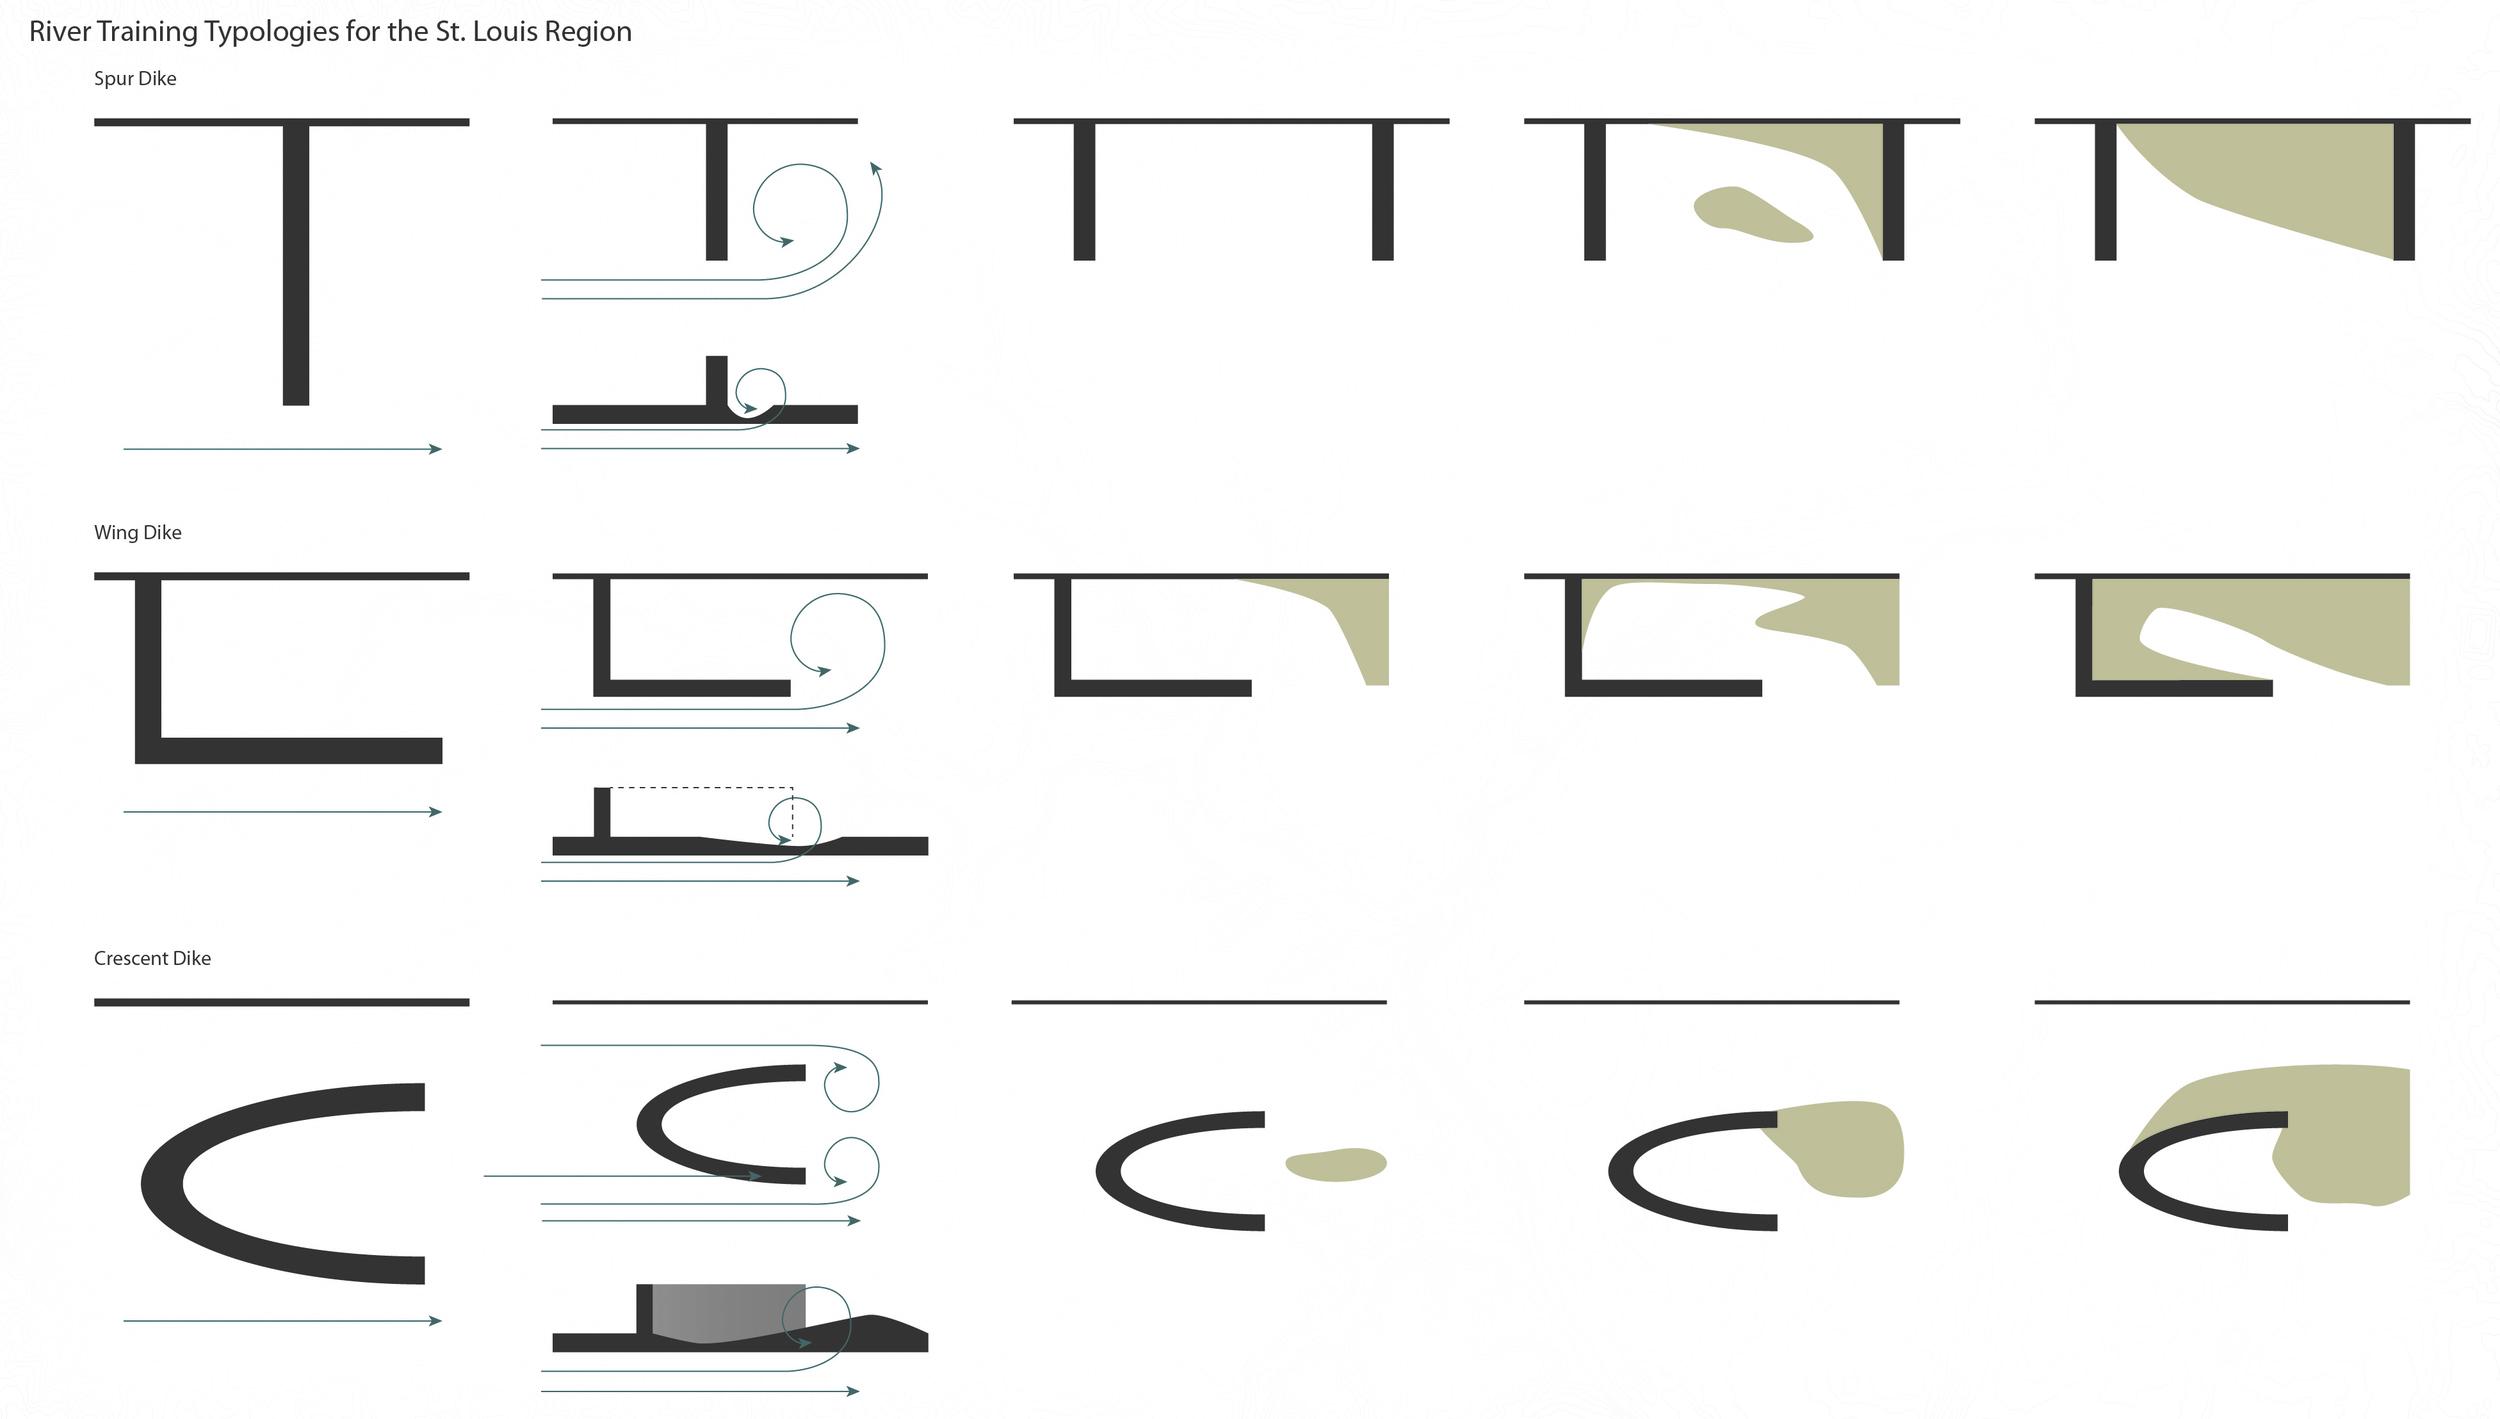 07_Sediment_Pucks_Tiffin_Thompson_River_Training_Typologies.jpg